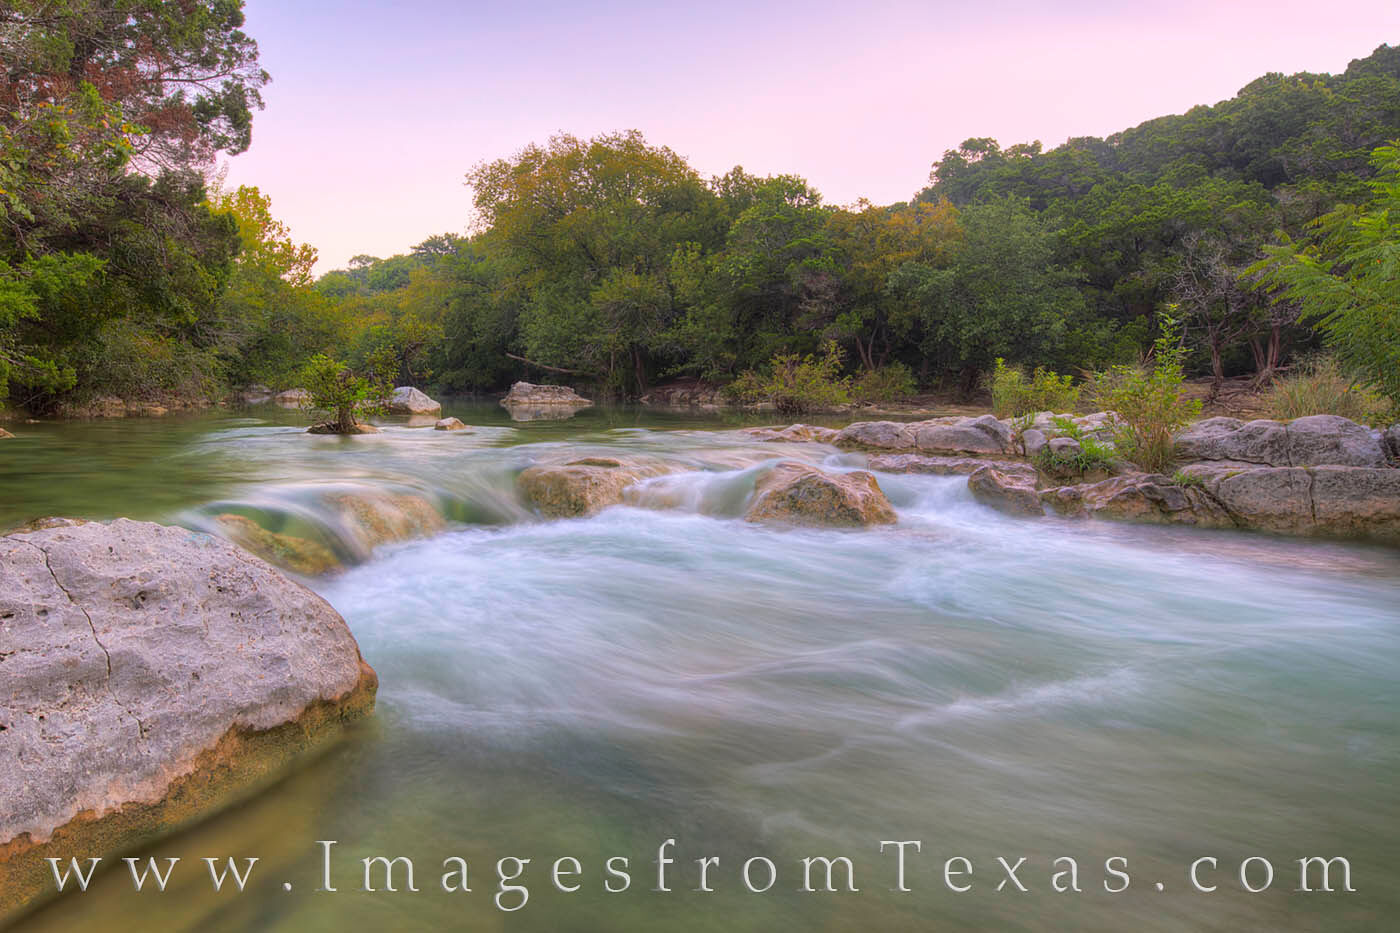 barton creek greenbelt, austin texas, austin greenbelt, twin falls, austin hiking, austin texas photos, photo